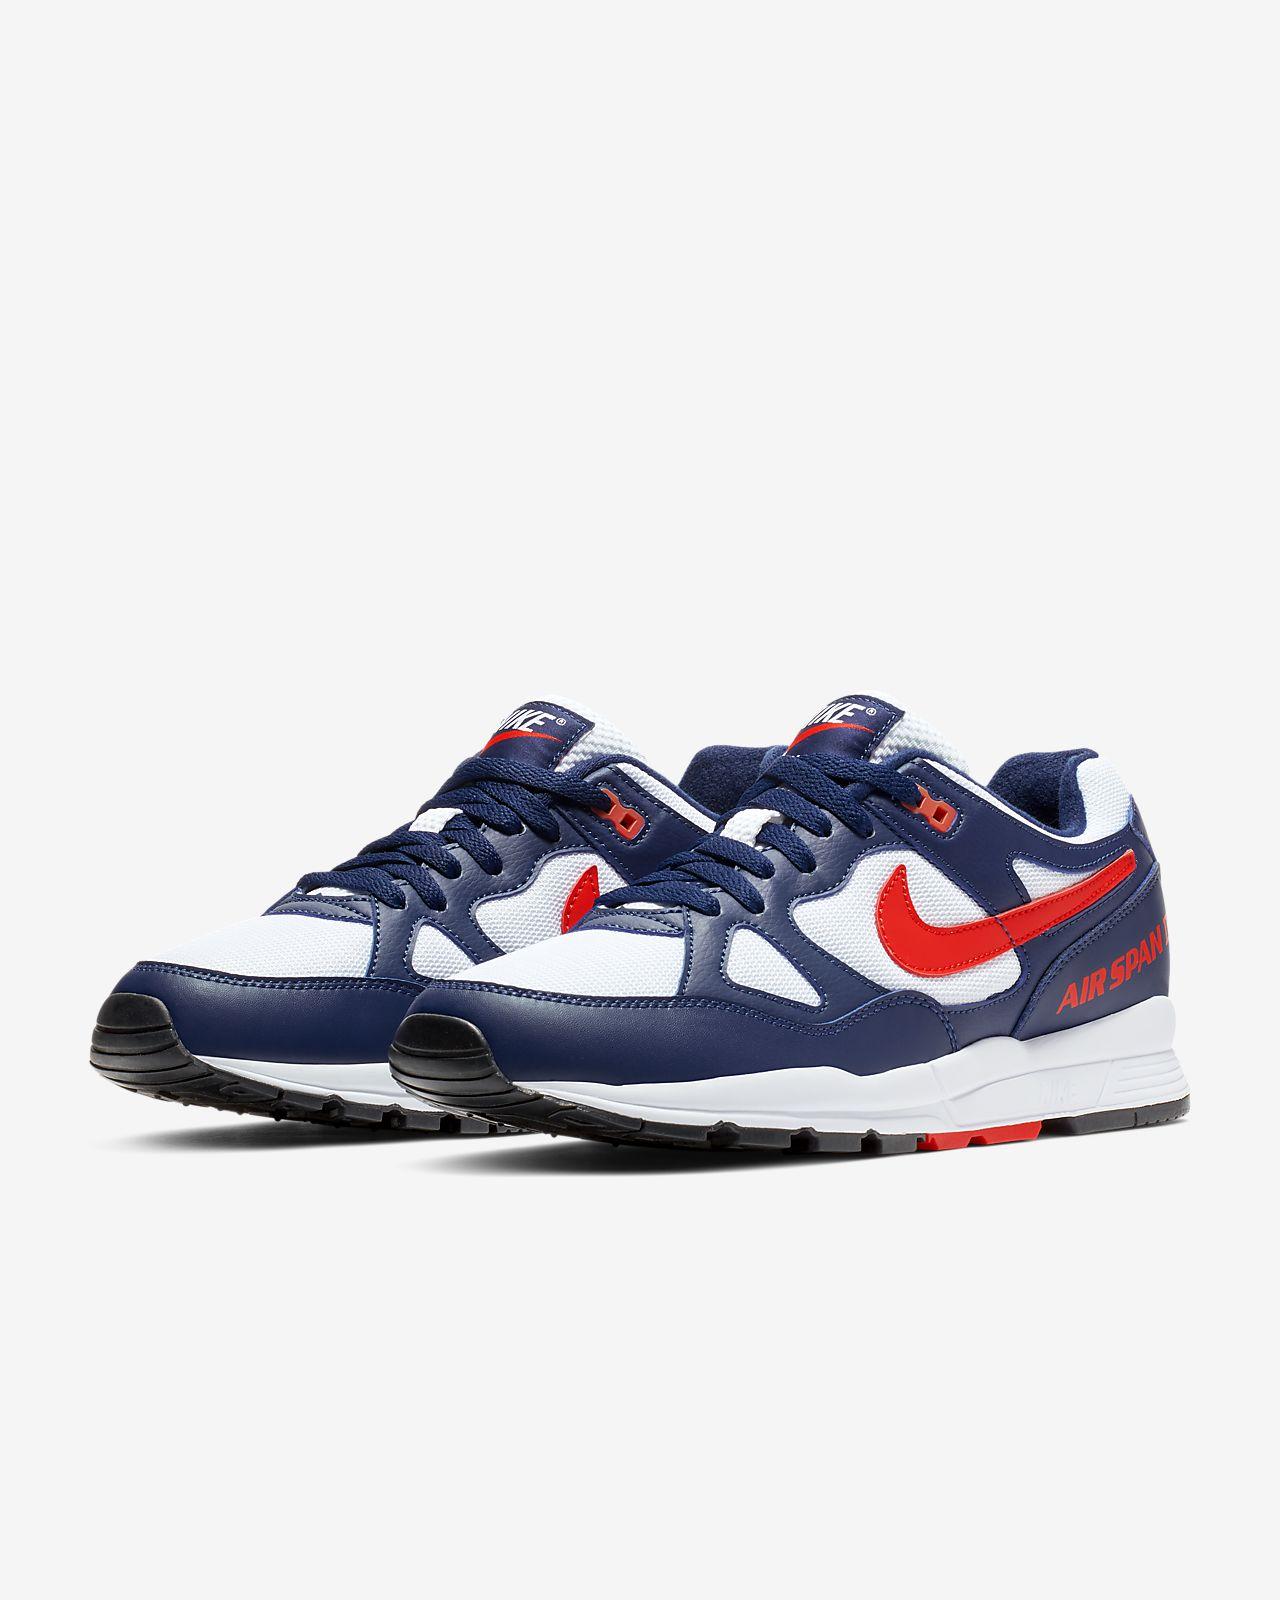 cacb32ac3b54 Nike Air Span II Men s Shoe. Nike.com ID